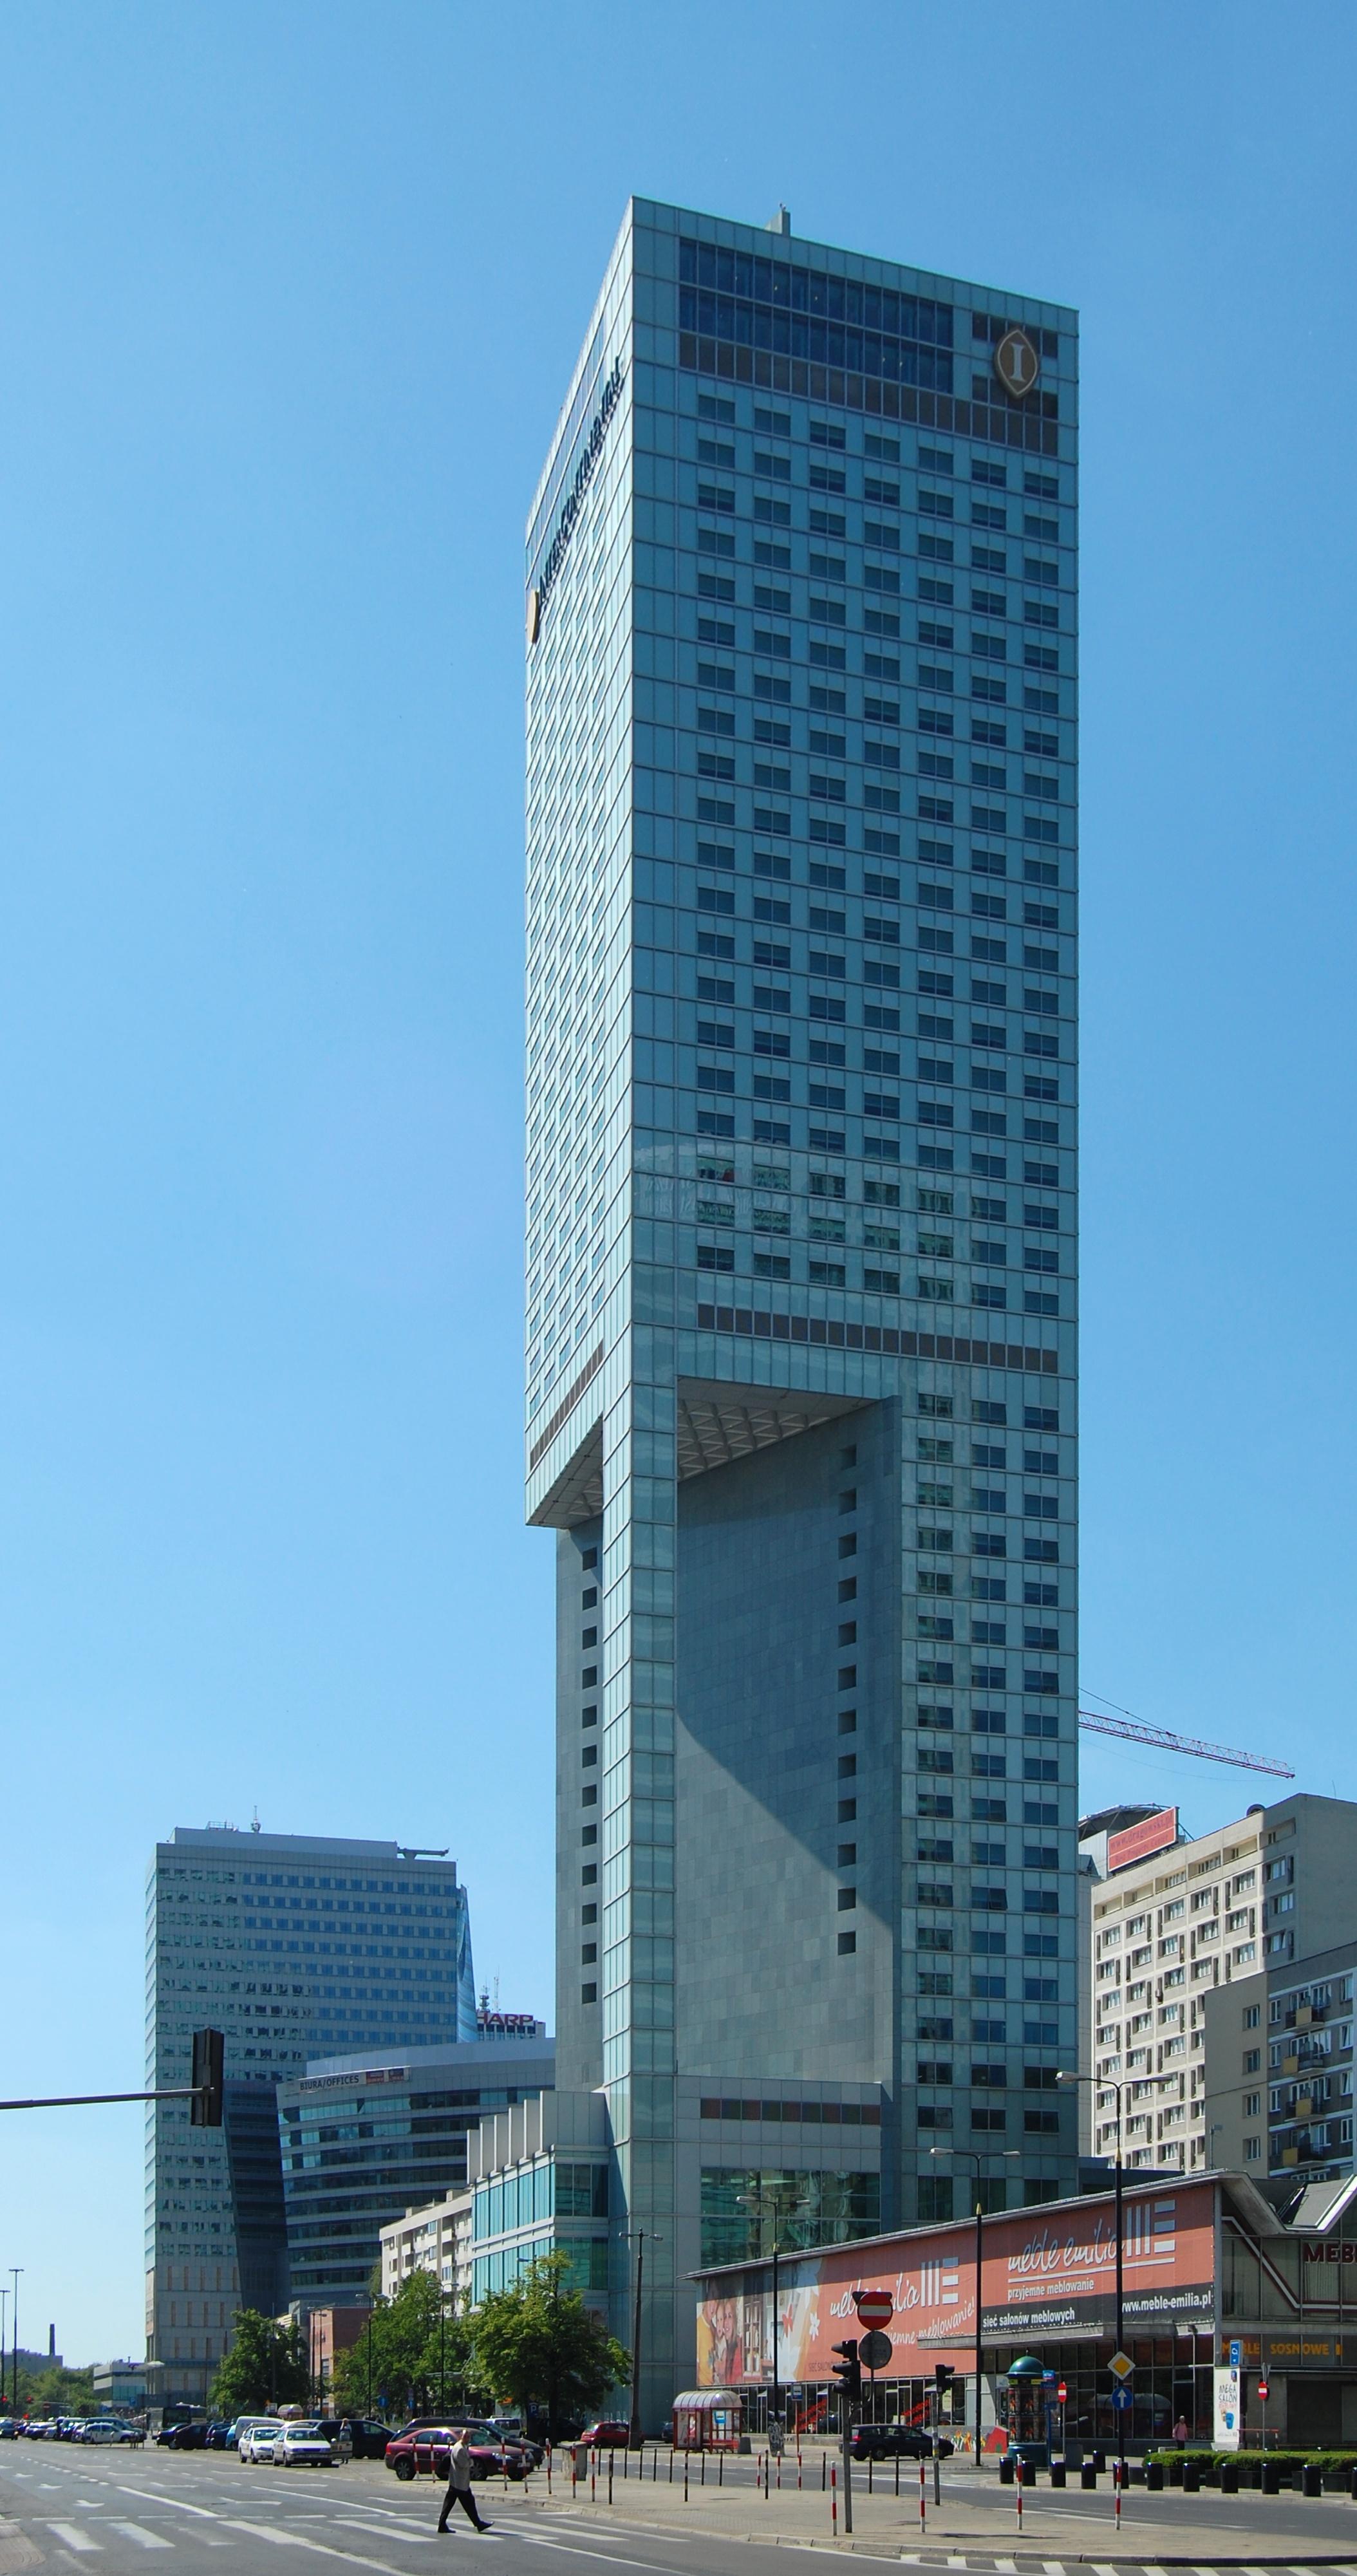 The W Hotel Chicago City Center